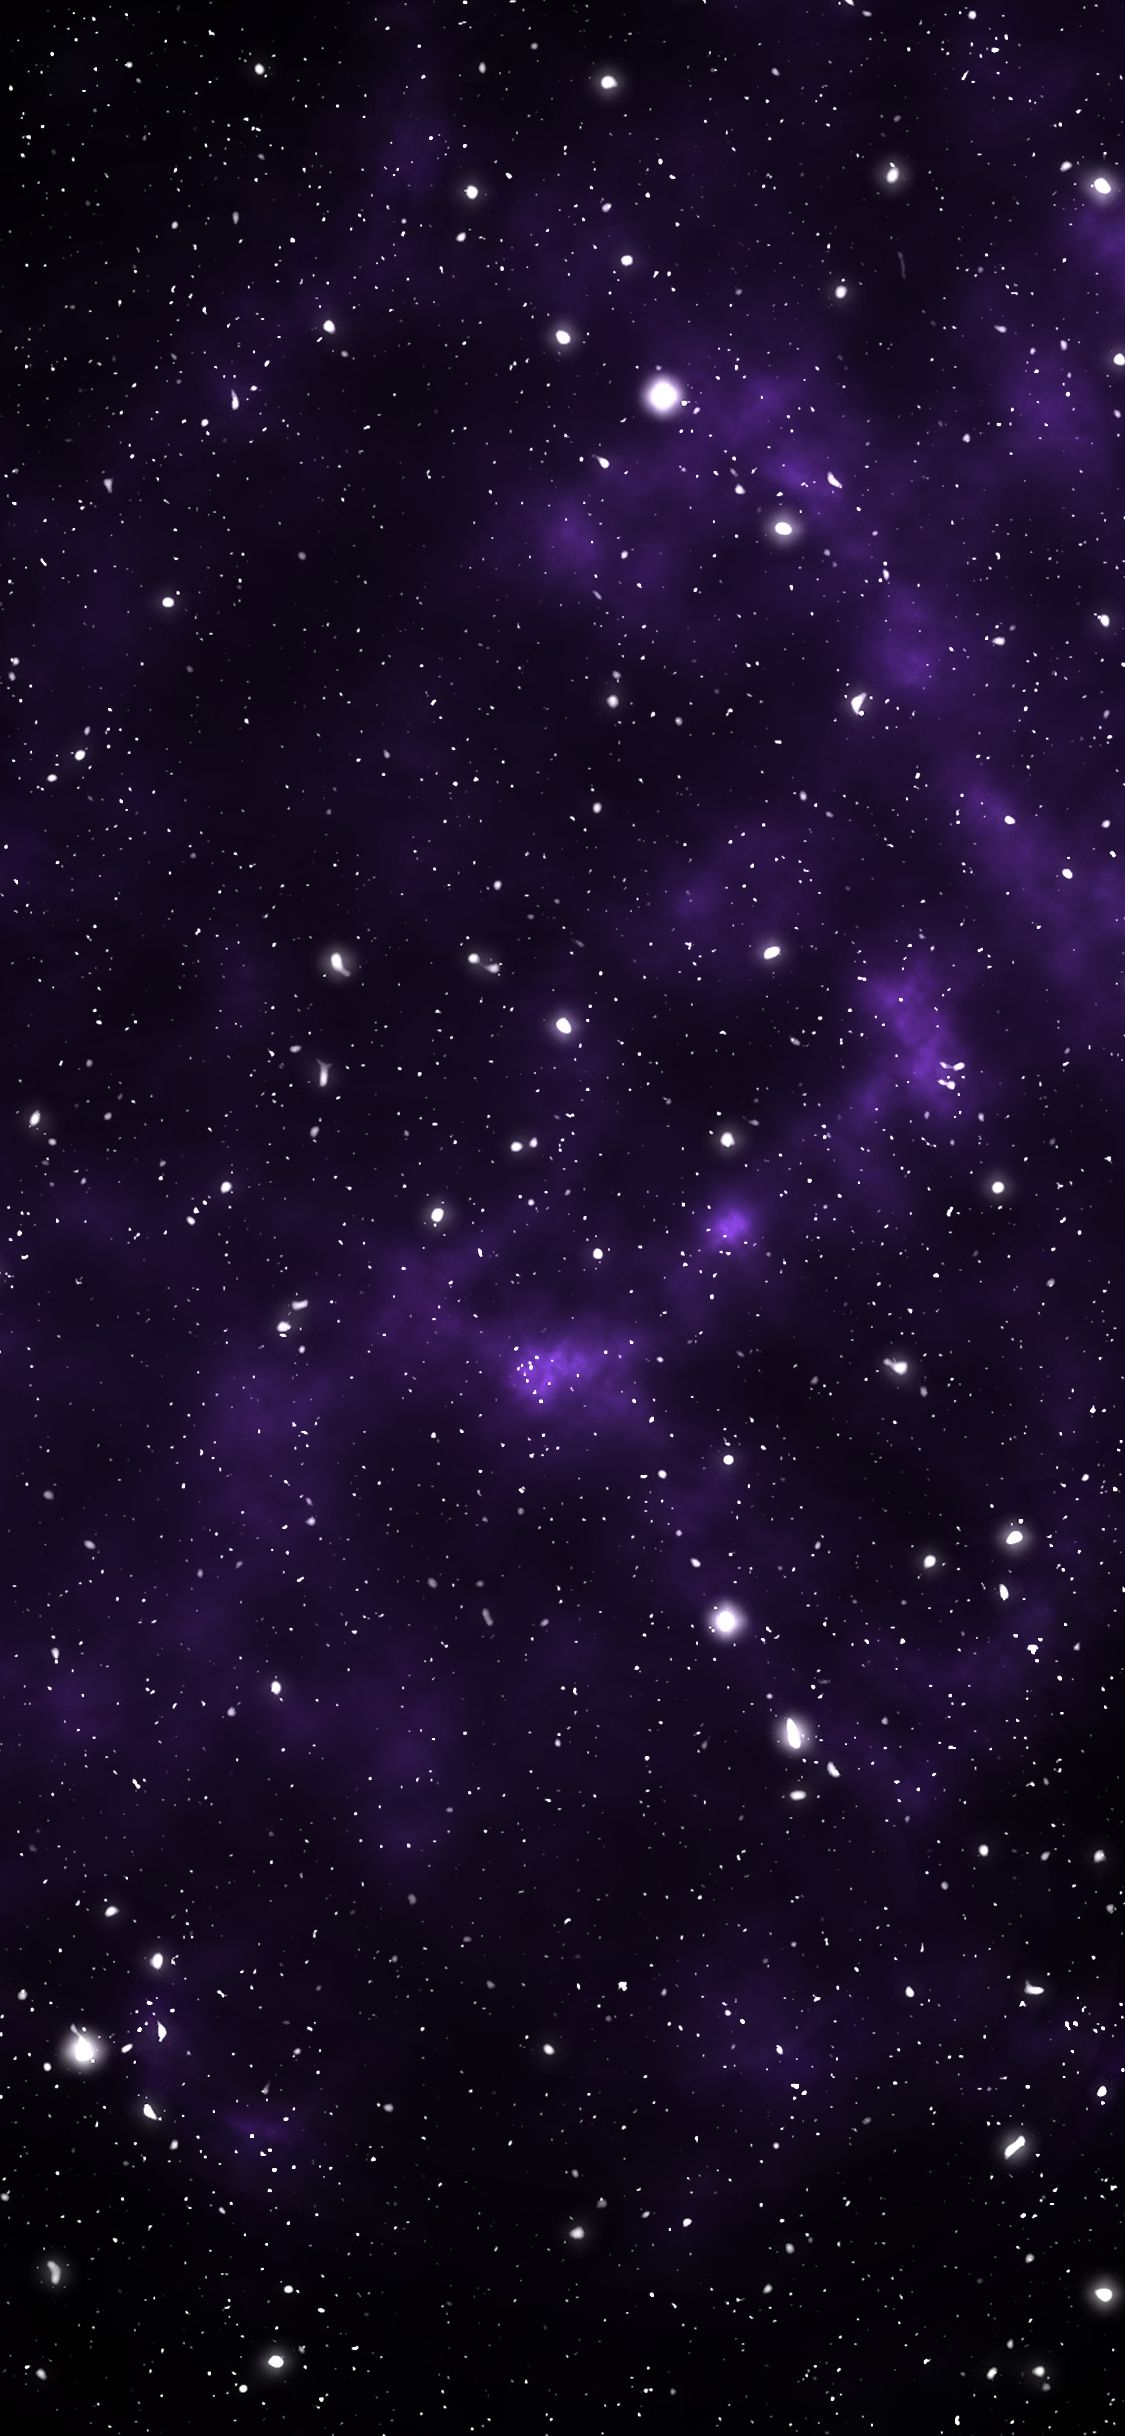 Best Galaxy Wallpaper Hd Iphone X Free Downloads In 2020 Galaxy